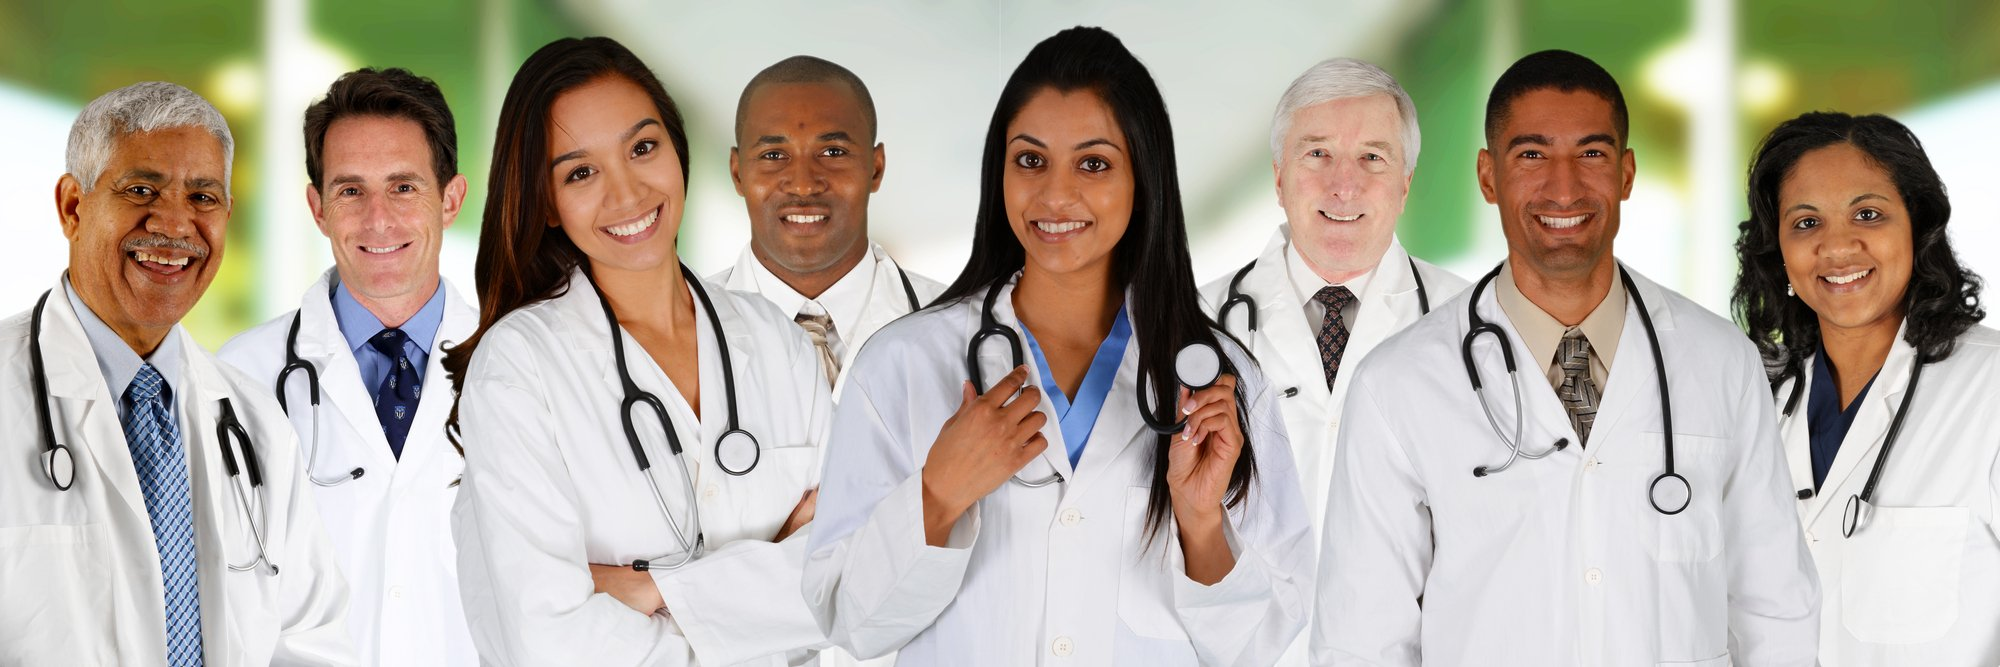 Latino doctors